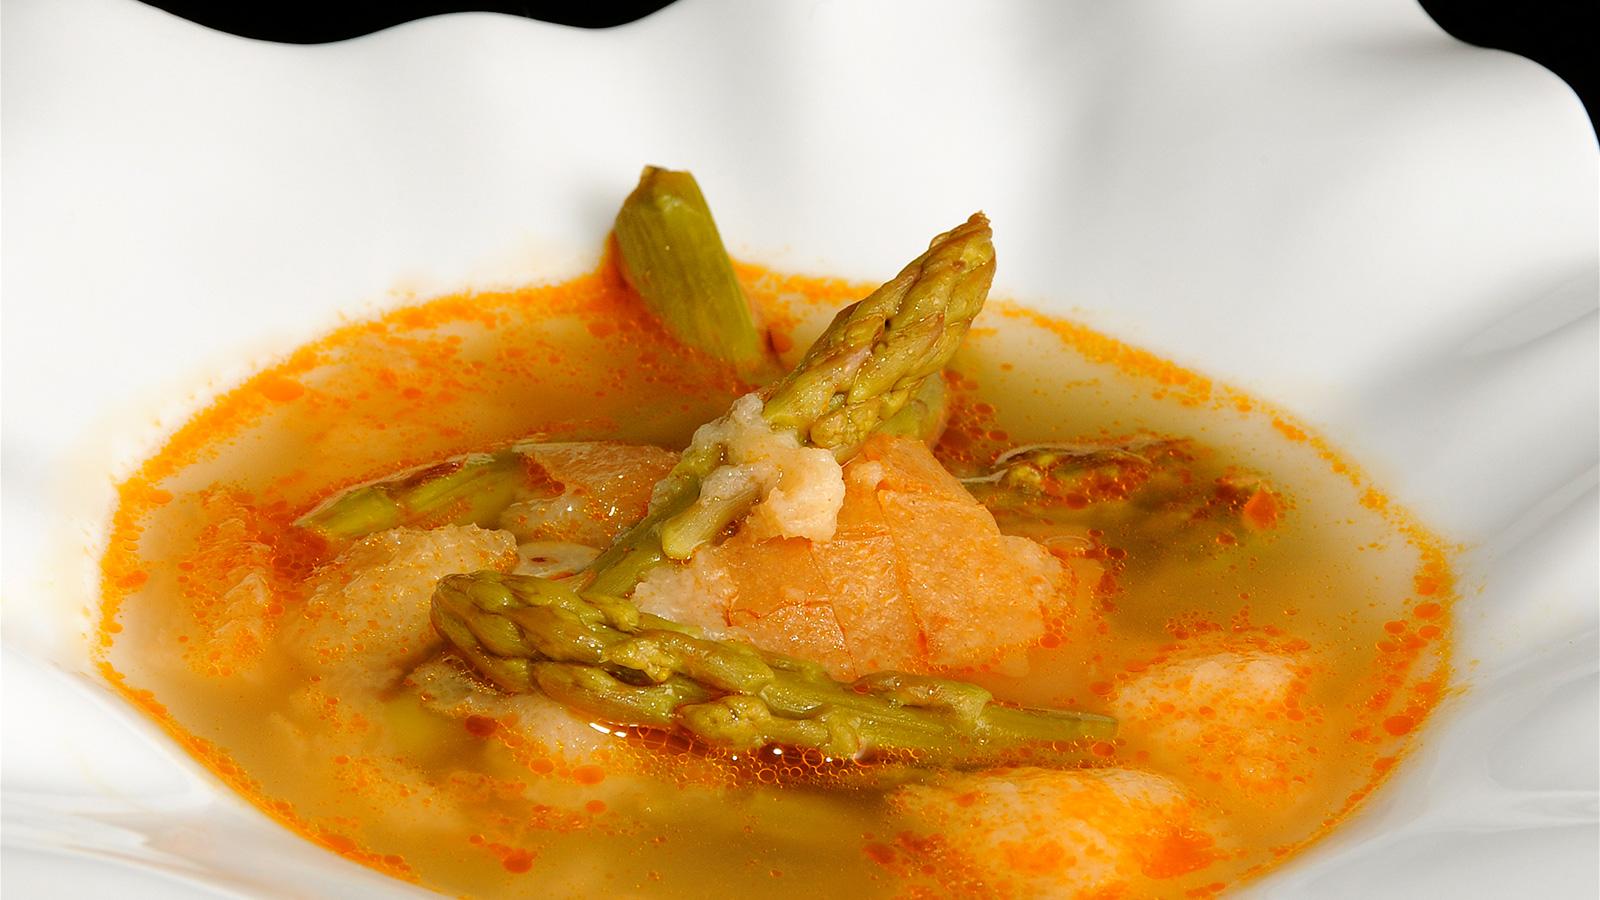 Gazpachuelo de esp rragos diana cabrera receta canal cocina - Diana cabrera canal cocina ...